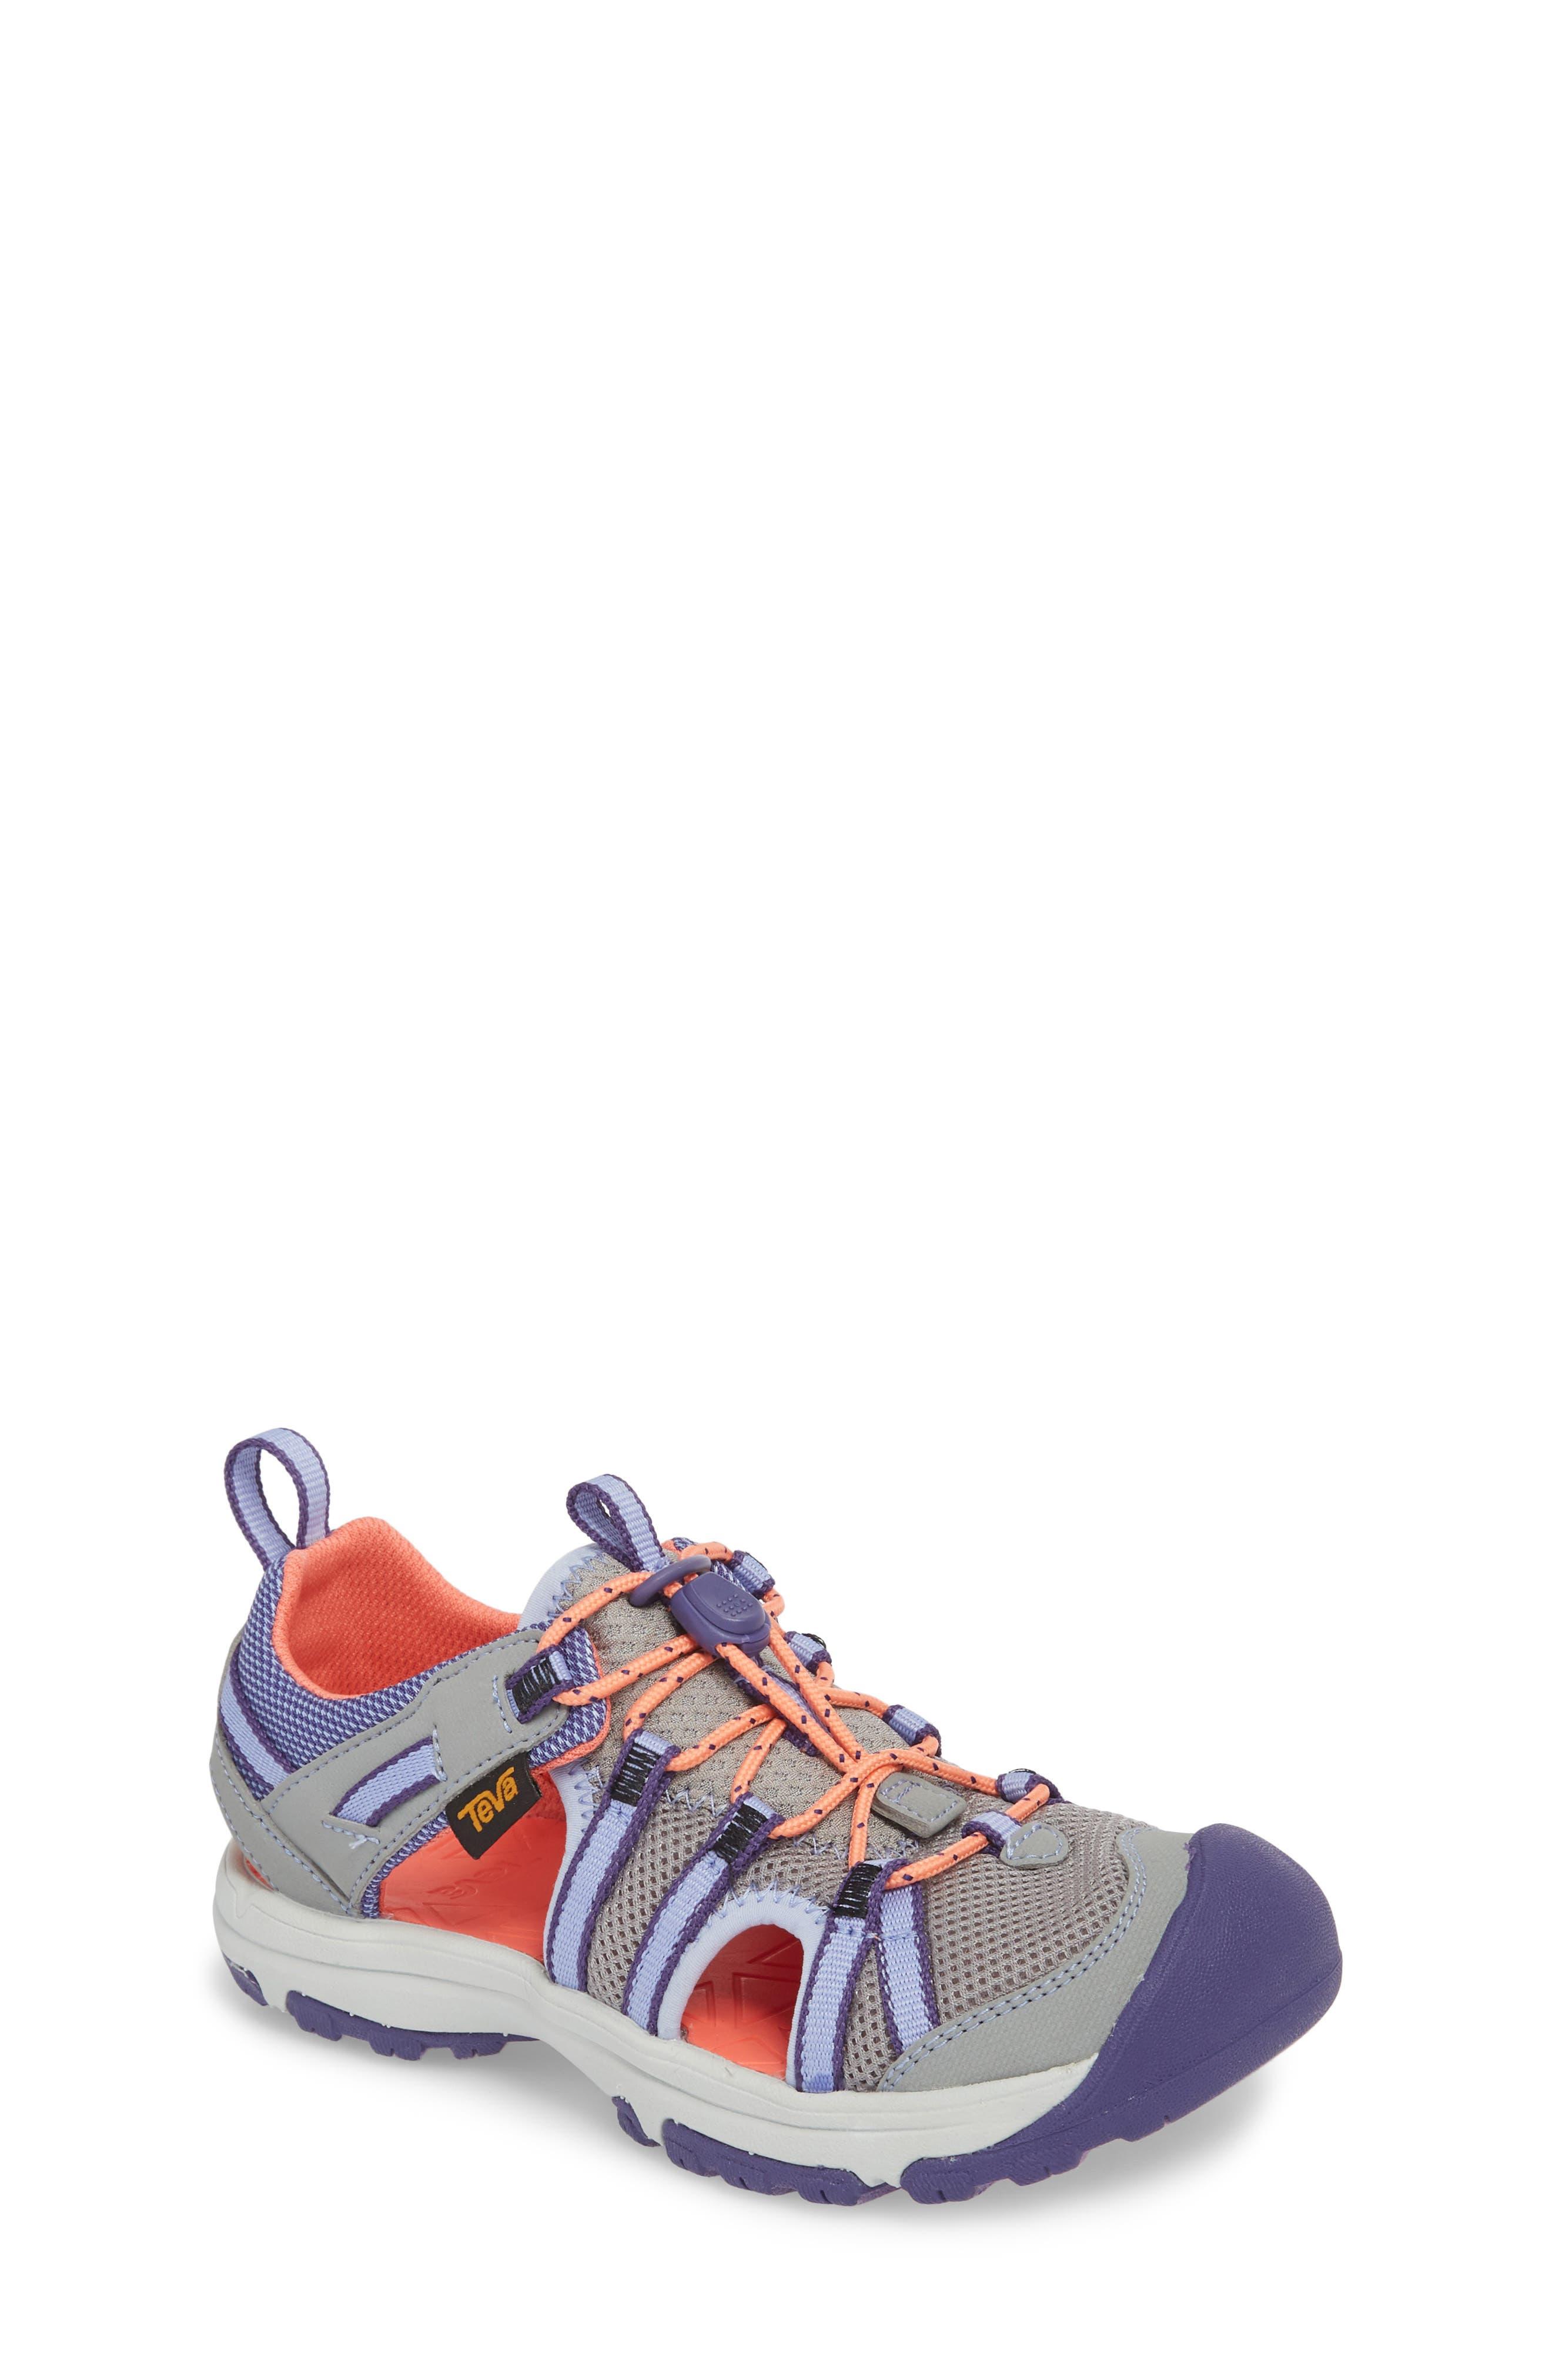 Manatee Sport Sandal,                         Main,                         color, Wild Dove